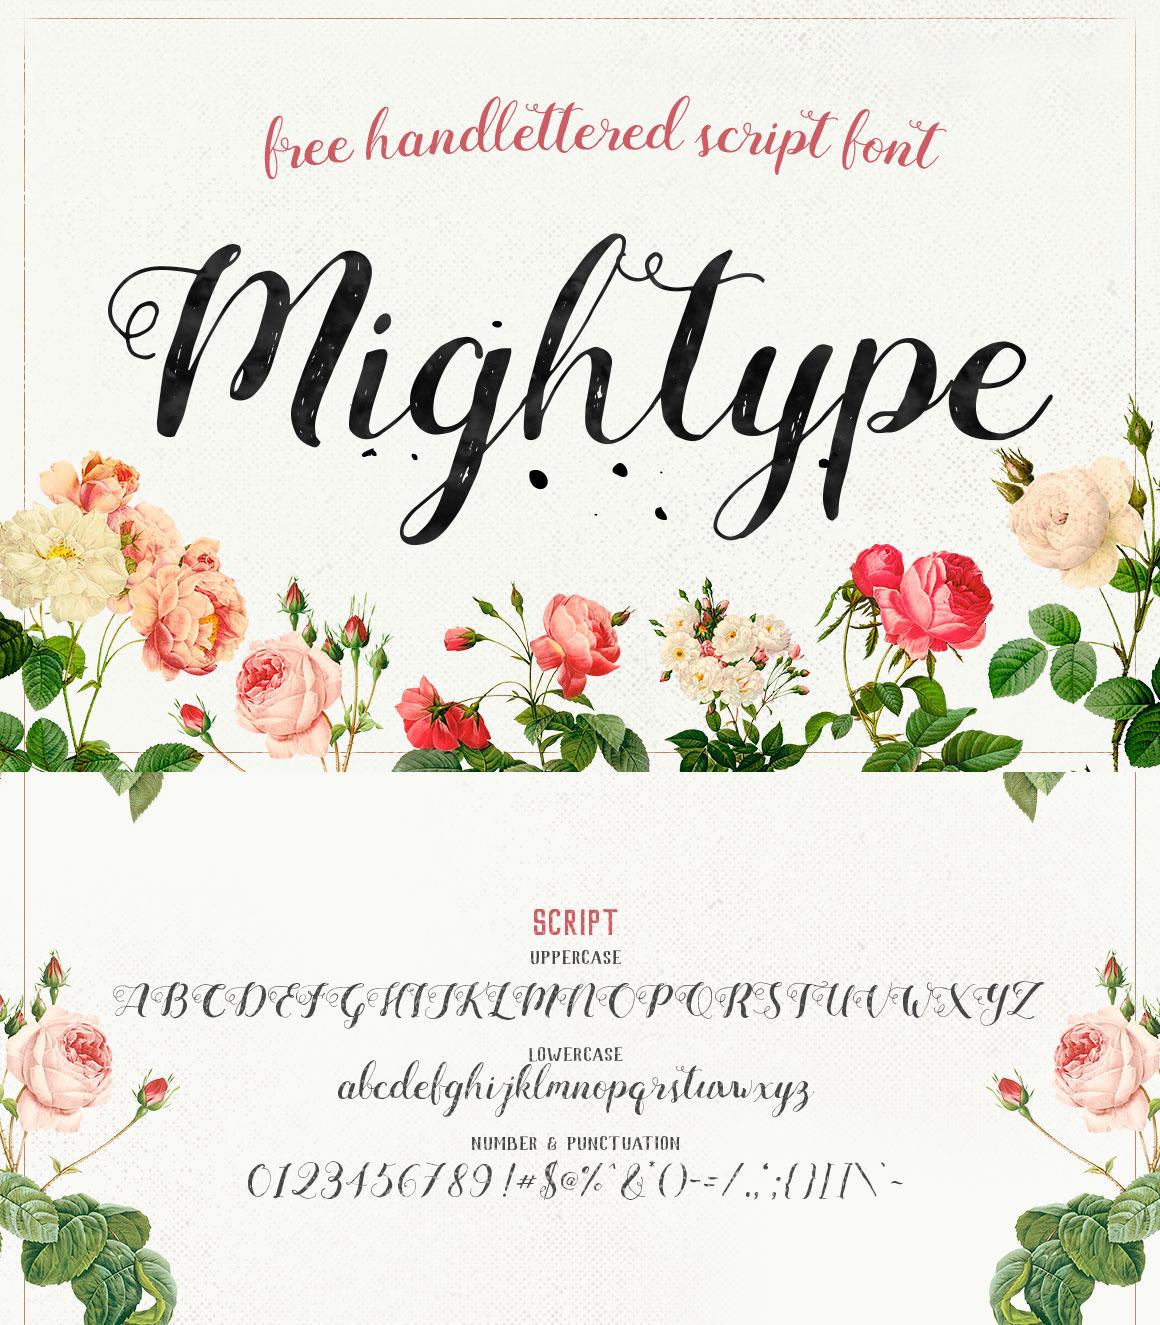 free font fonts lettering freebie Handlettering Script handdrawn handmade Typeface type inspiration creative handwriting